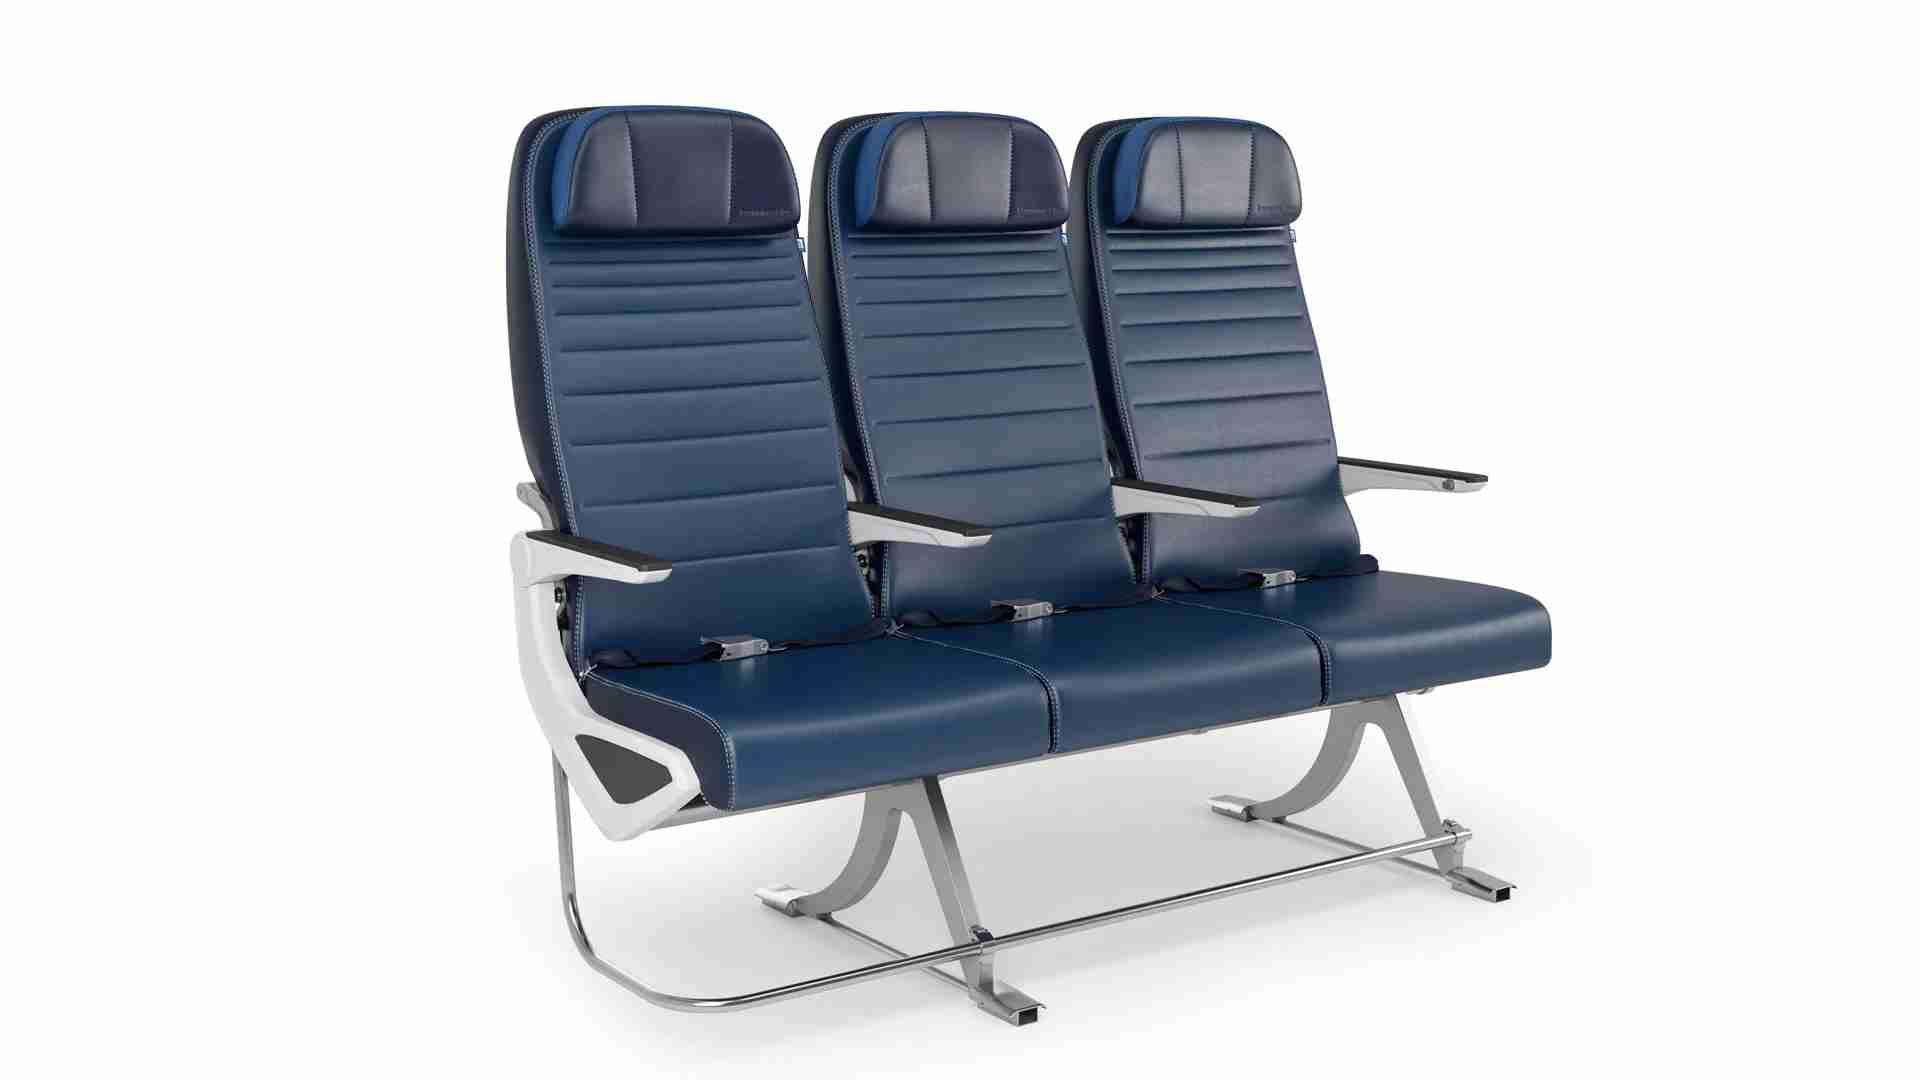 Collins Aerospace Aspire Coach Seating (Source: Collins Aerospace)